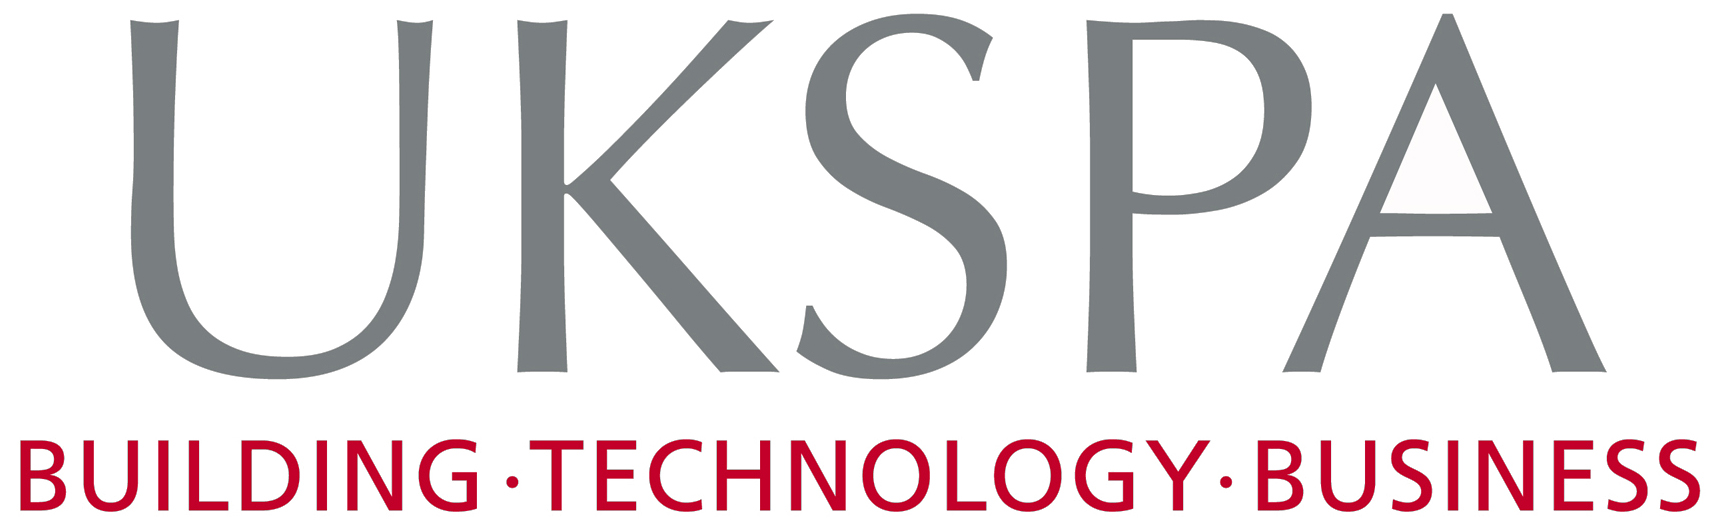 UKSPA logo